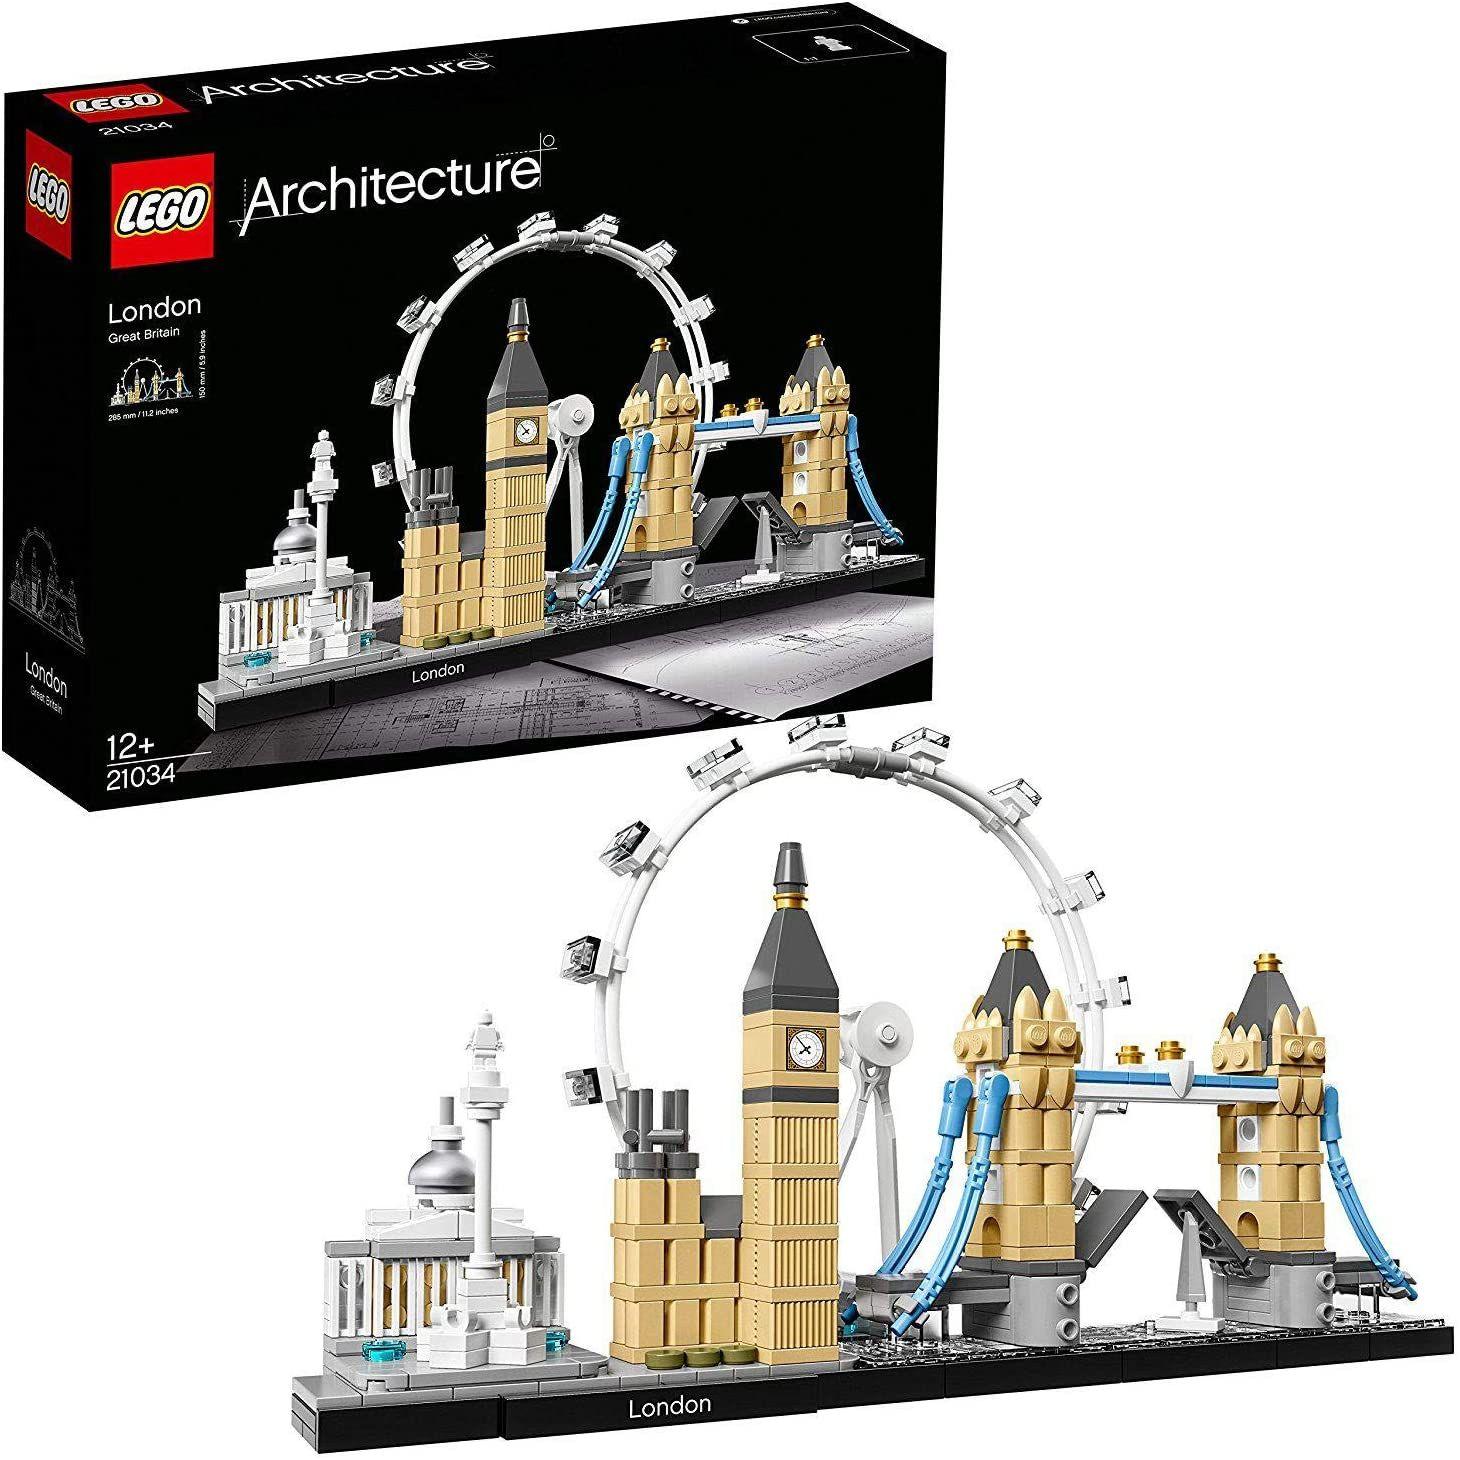 LEGO Architecture 21034 Skyline-Kollektion London (London Eye, Big Ben, Tower Bridge)